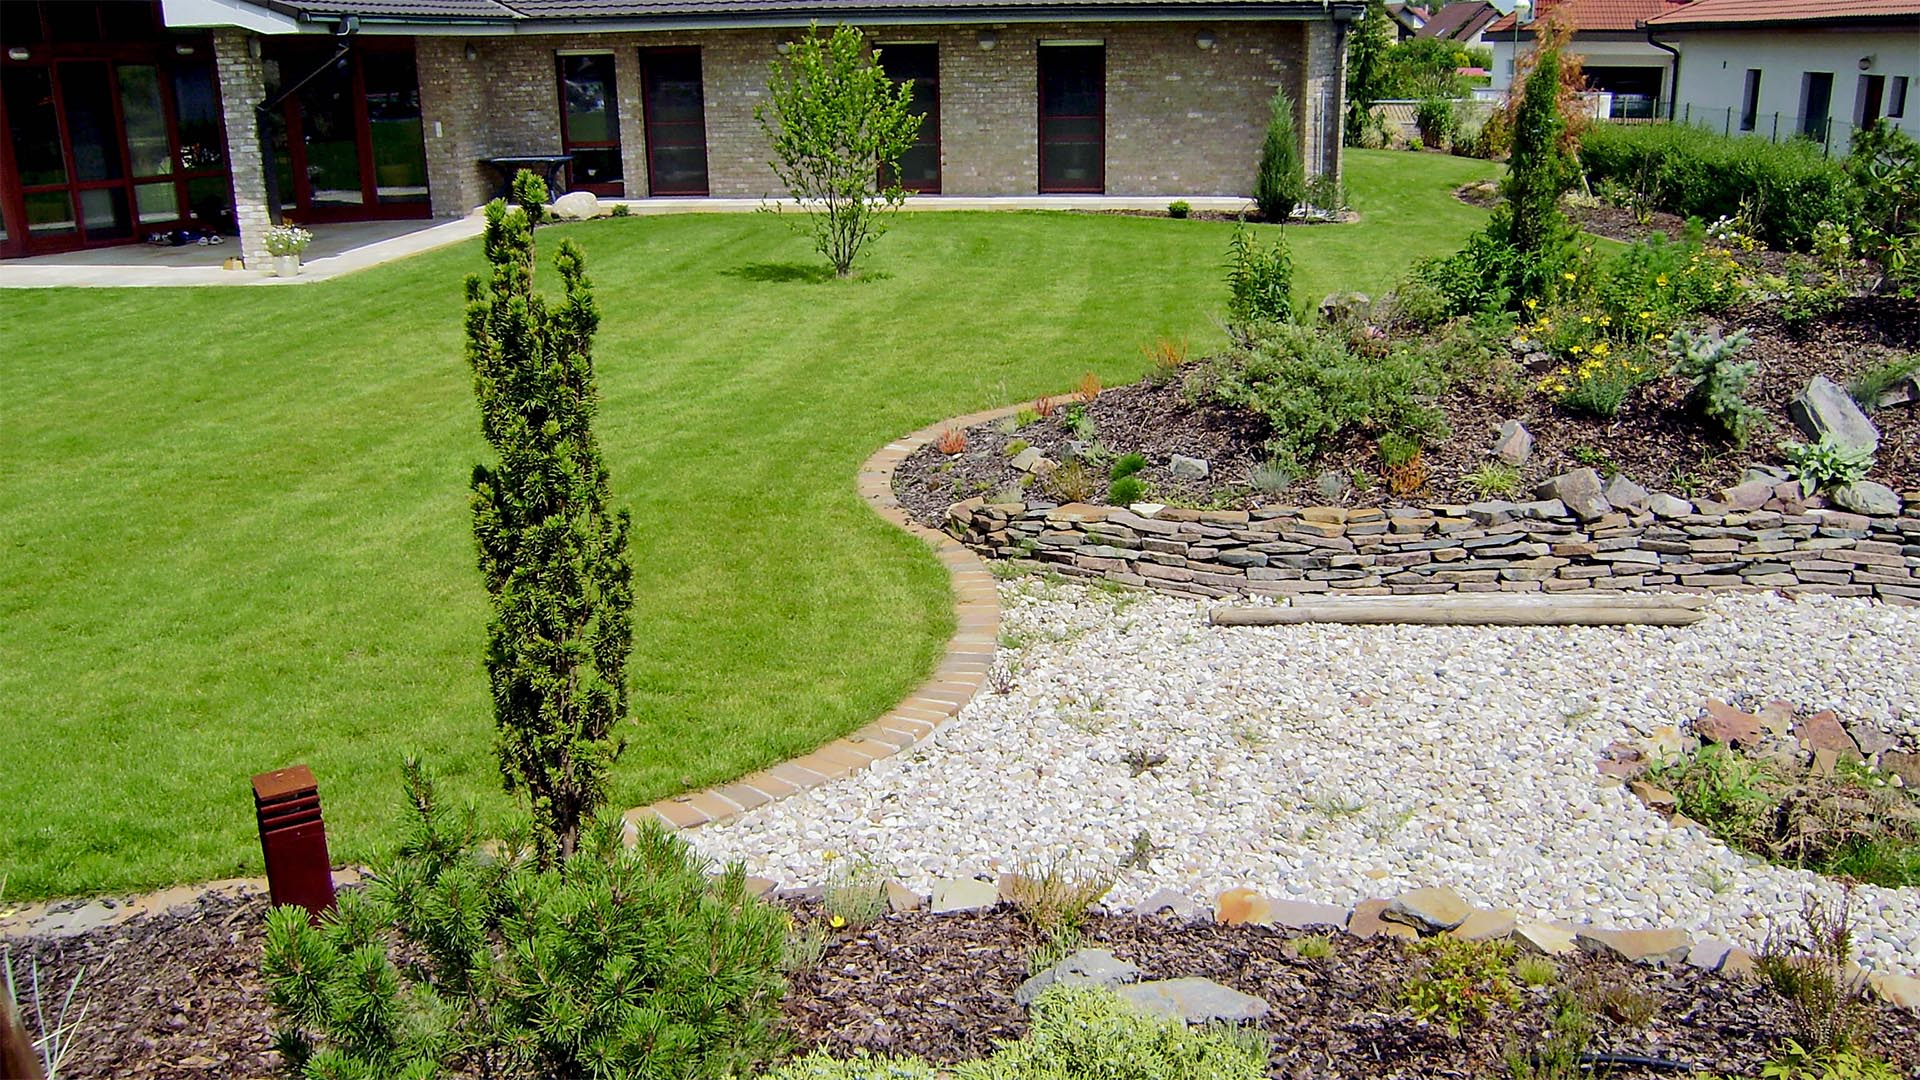 služby - údržba a realizace zahrad